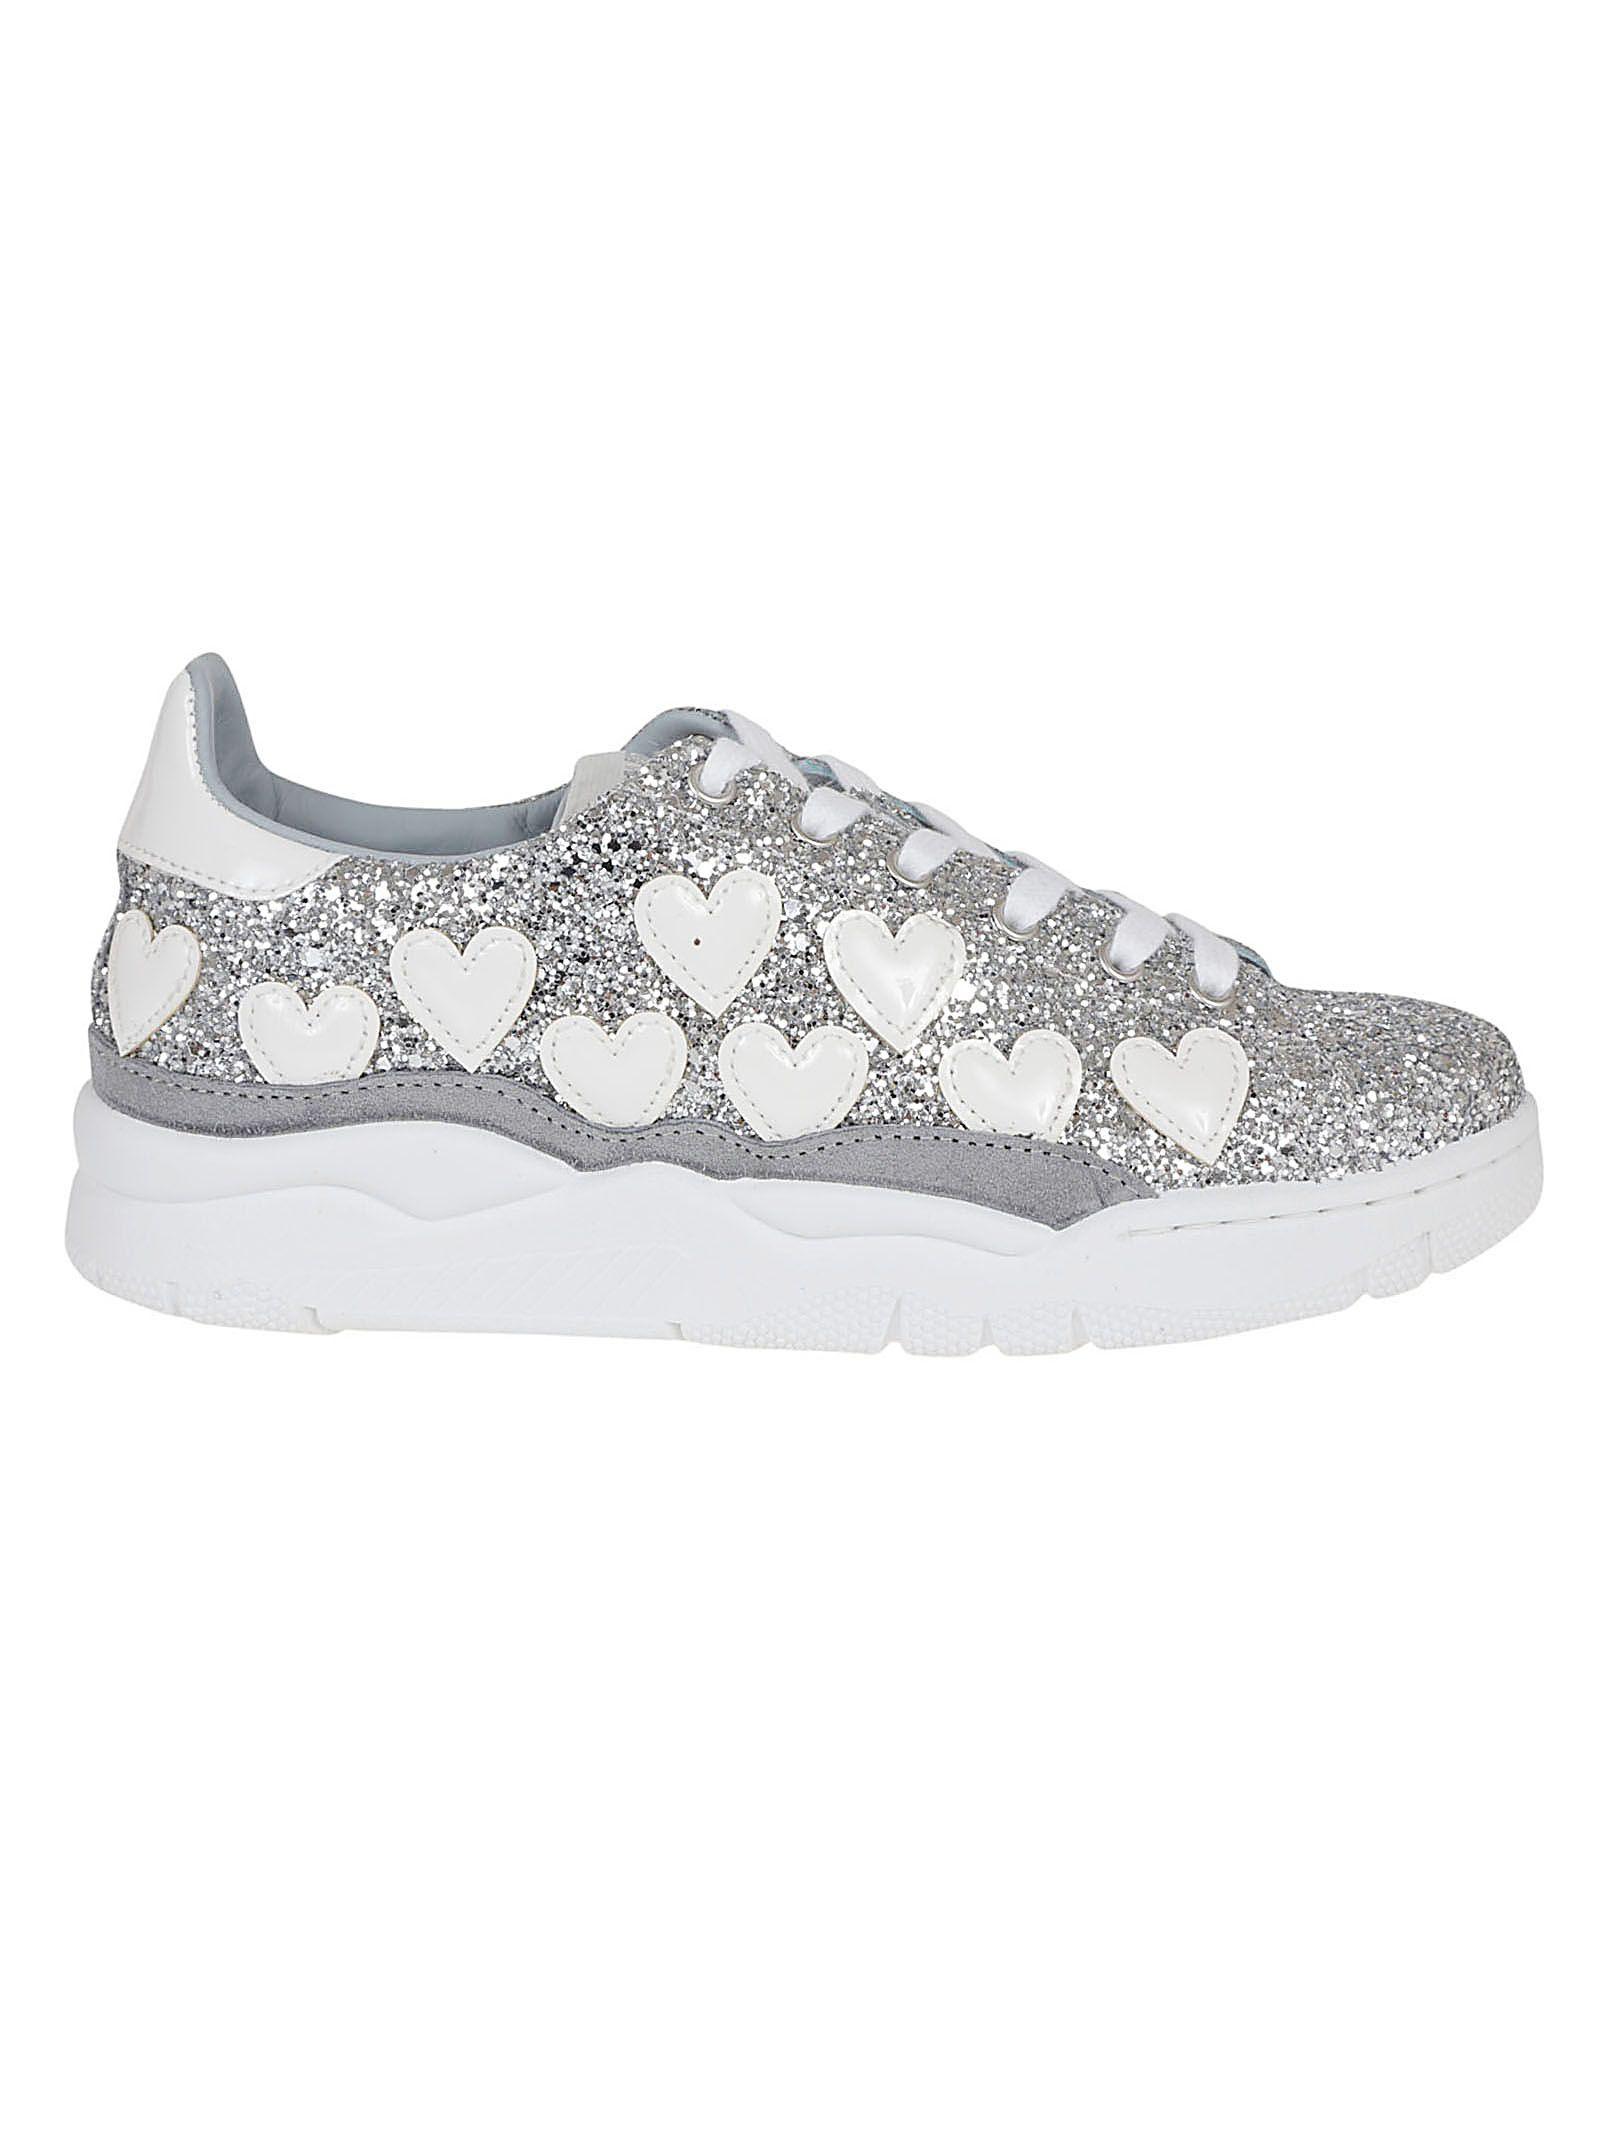 Chiara Ferragni Hearts Glitter Sneakers In Silver